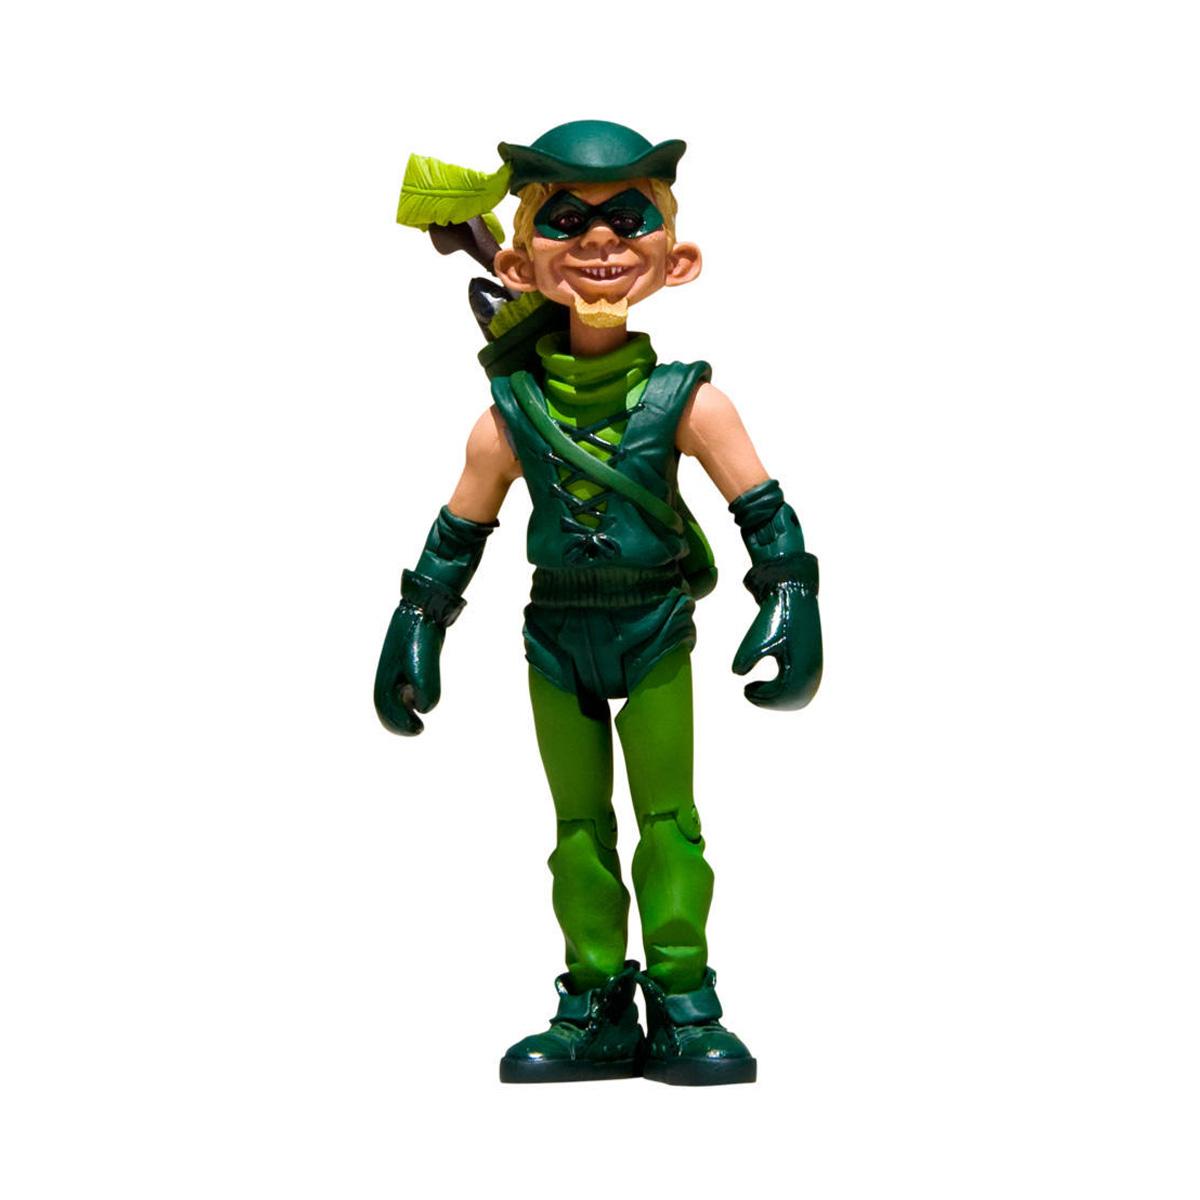 Boneco (Action Figure) MAD Just-Us League Arqueiro Verde